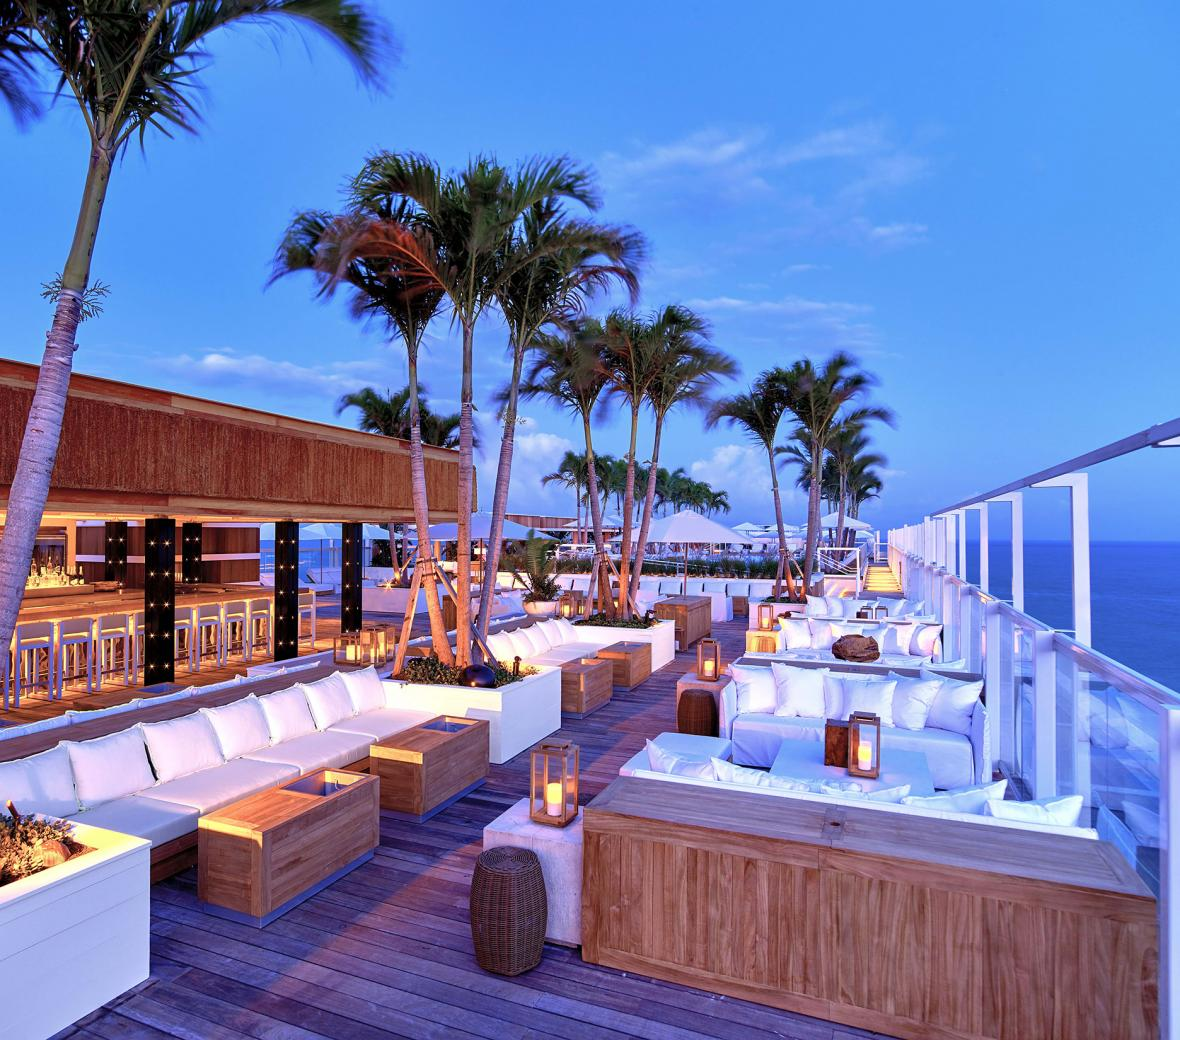 South Beach Rooftop Bar Lounge